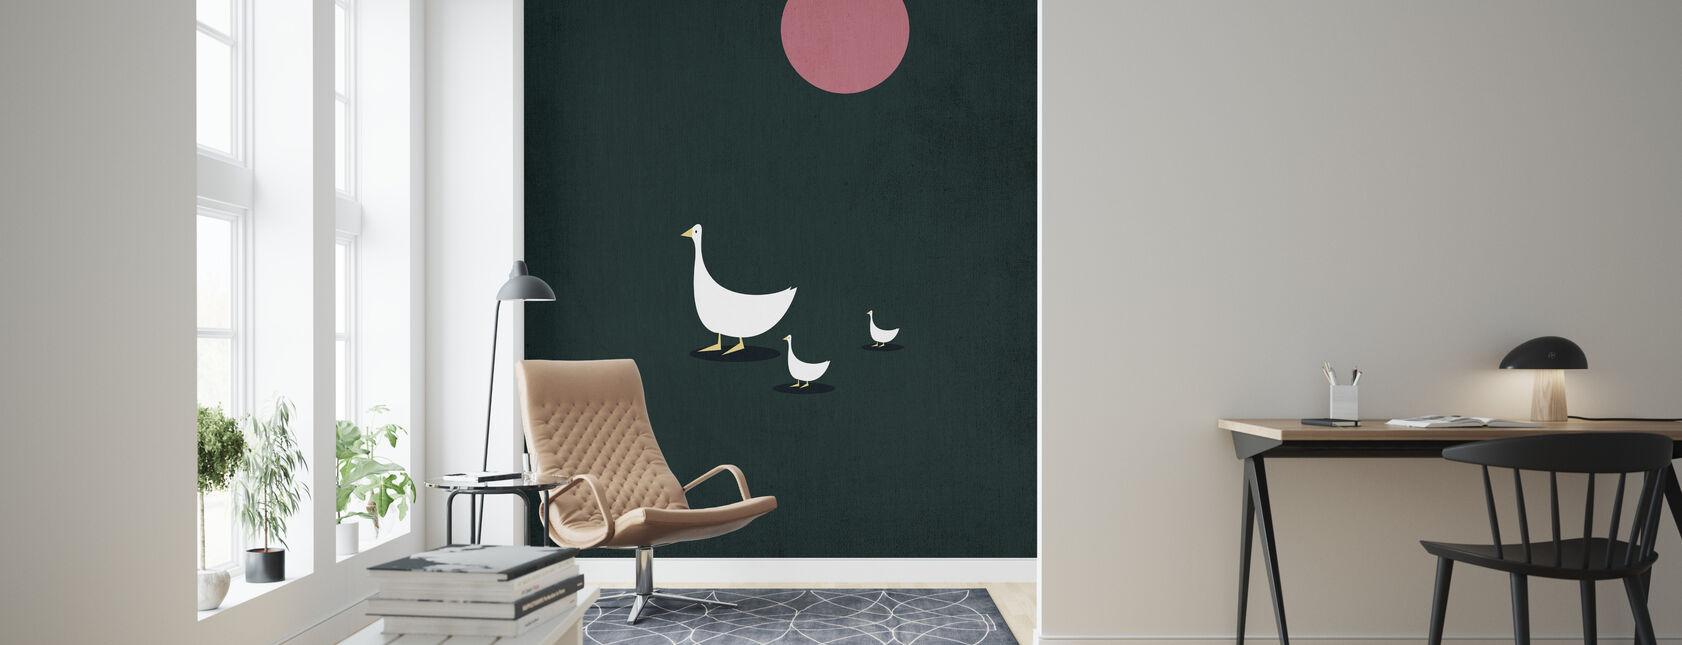 Sunny Side of Life - Wallpaper - Living Room